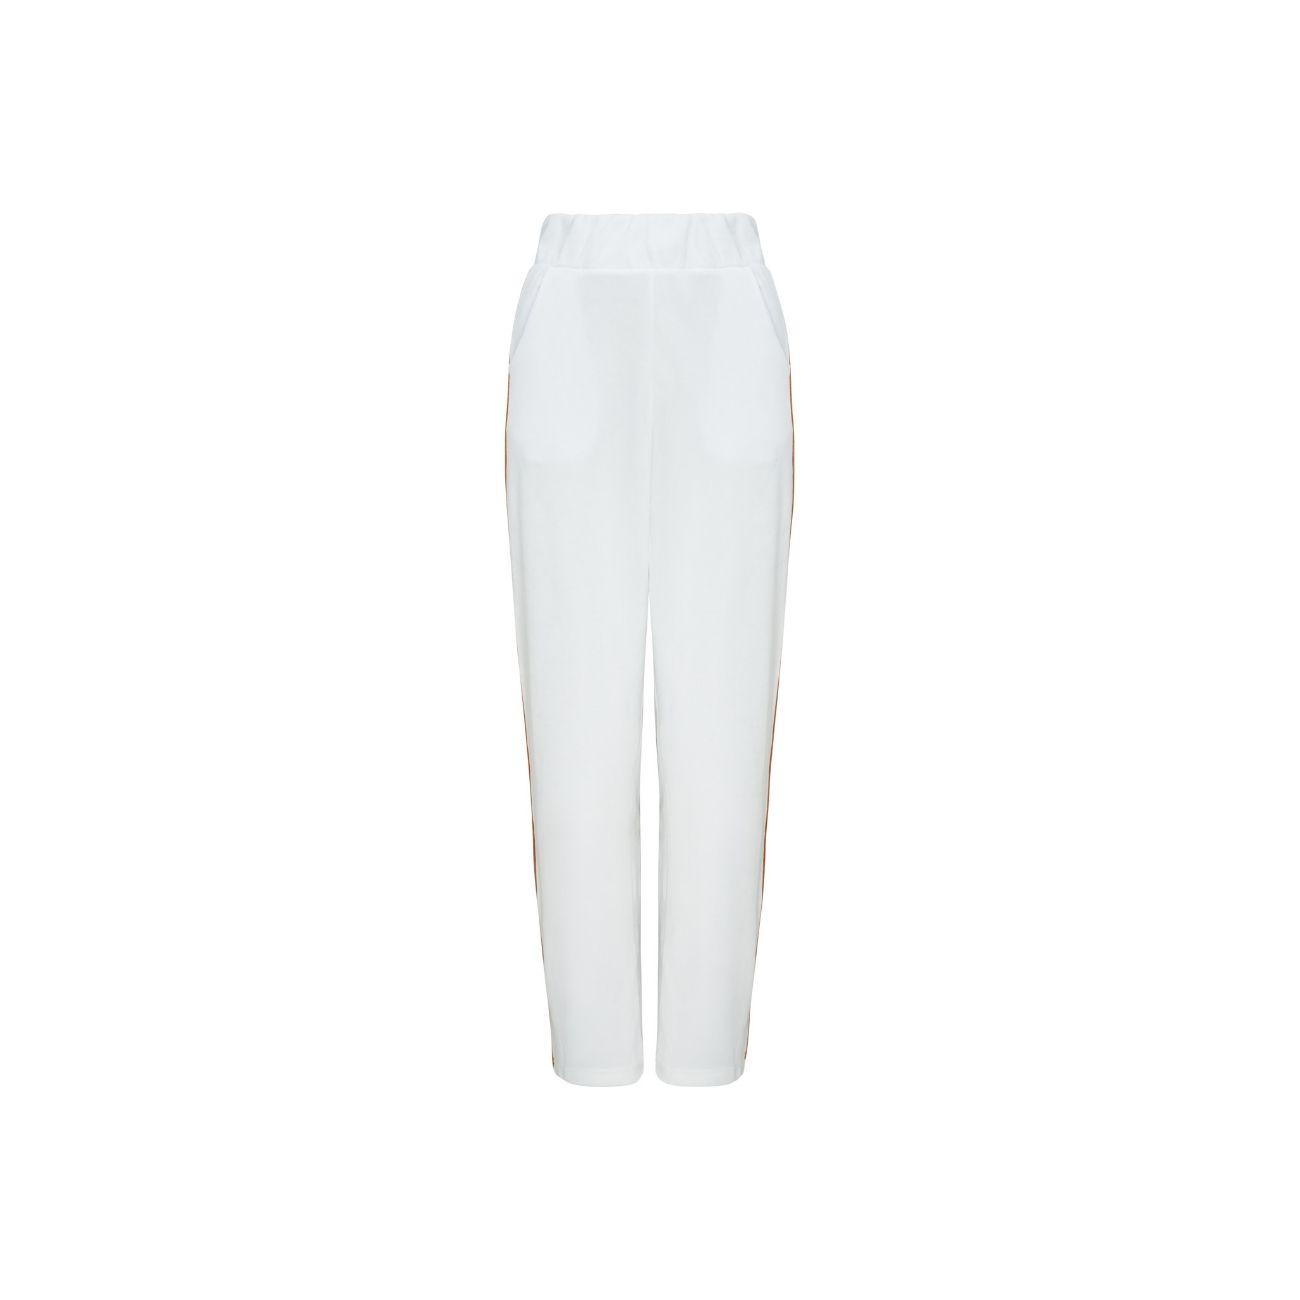 Sport Angel women's velour pants